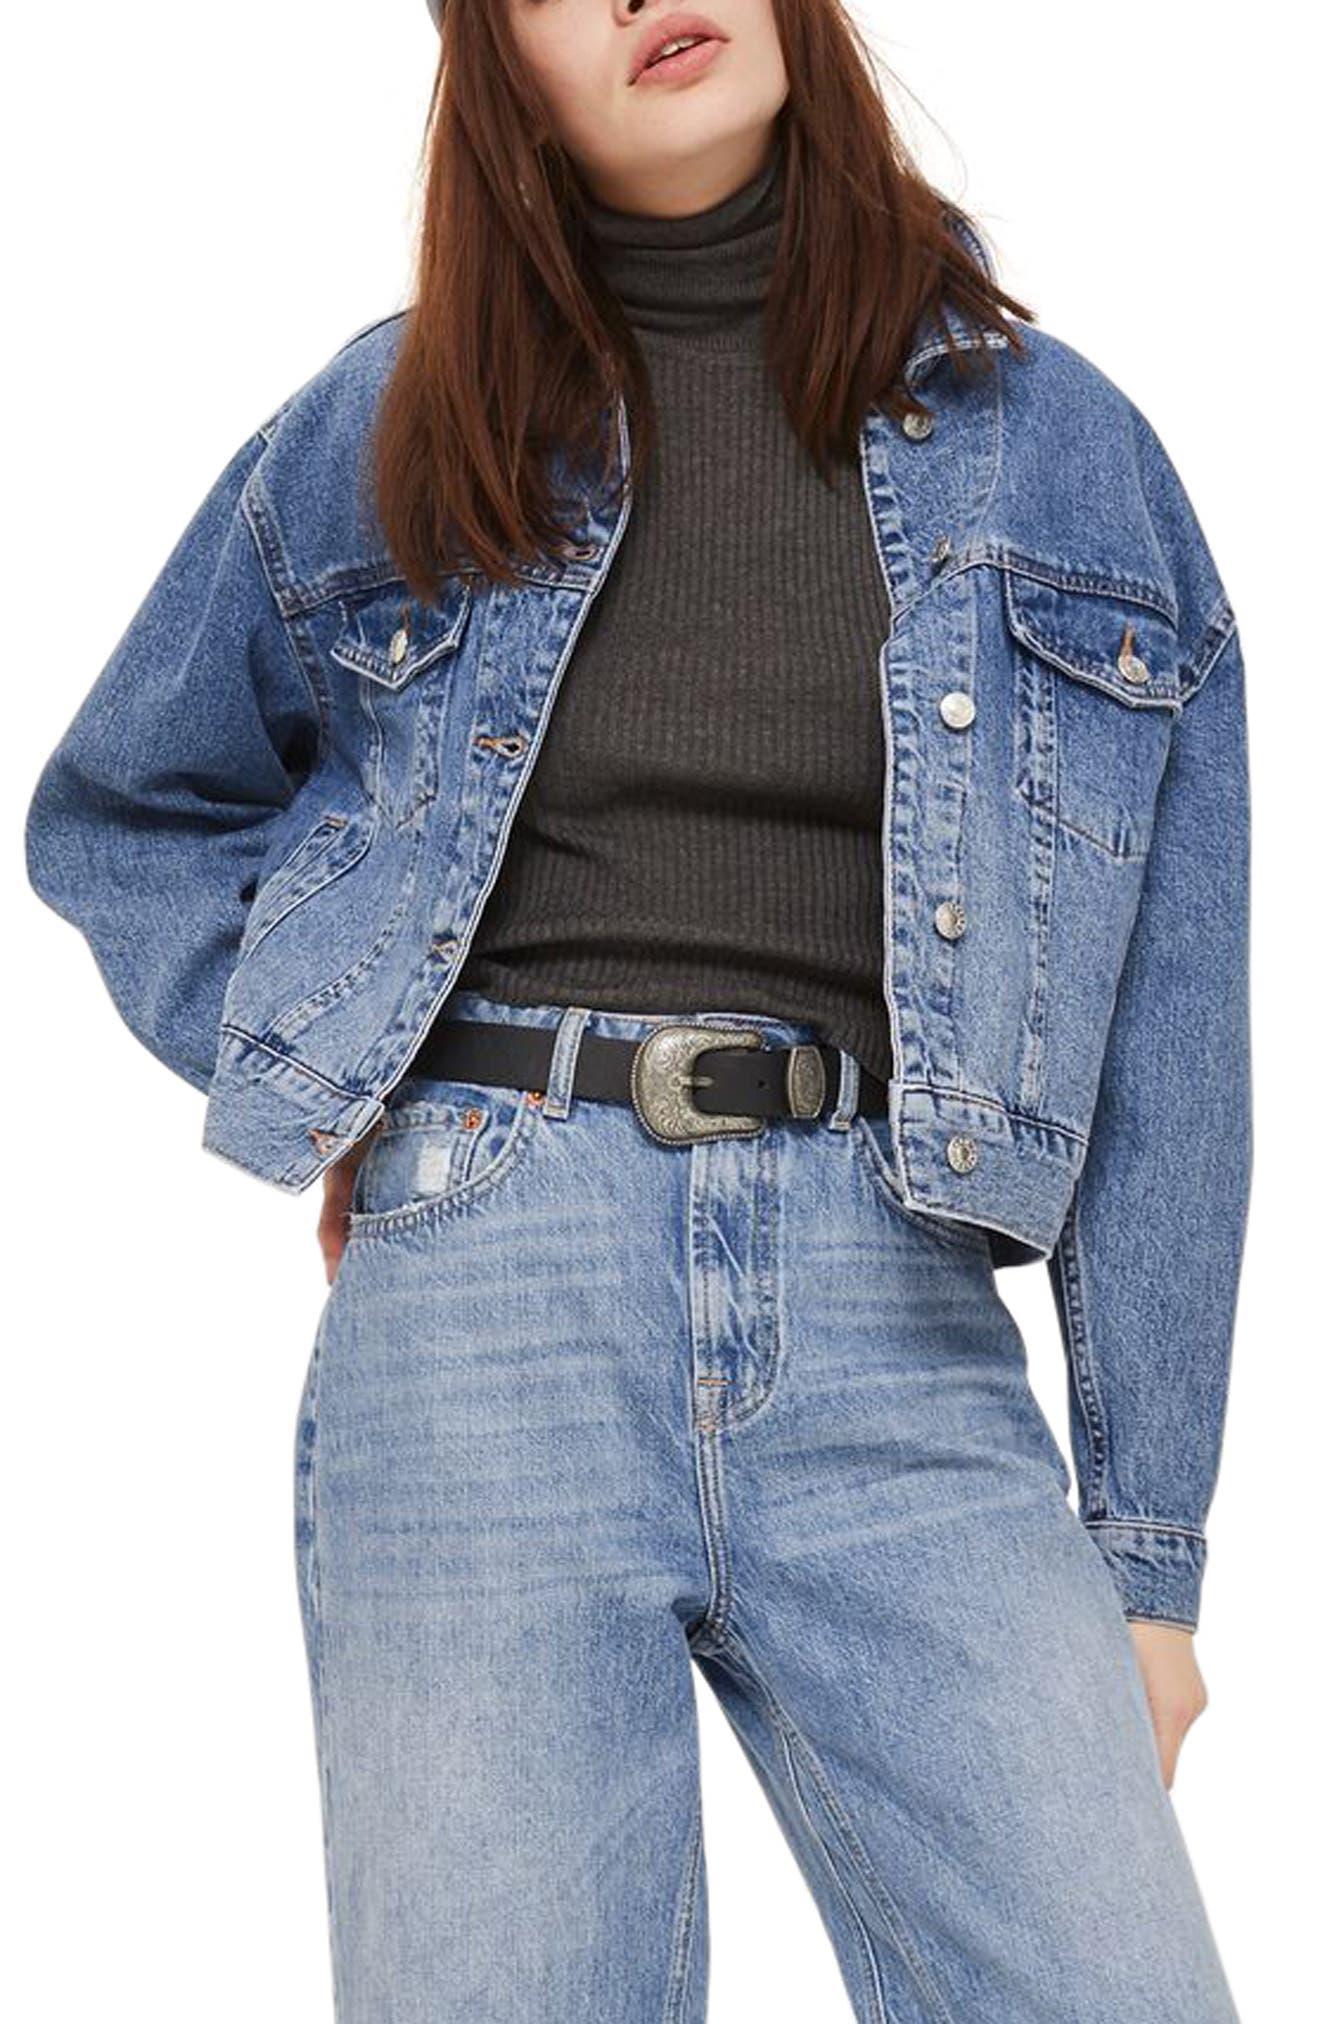 Topshop Boxy Crop Denim Jacket